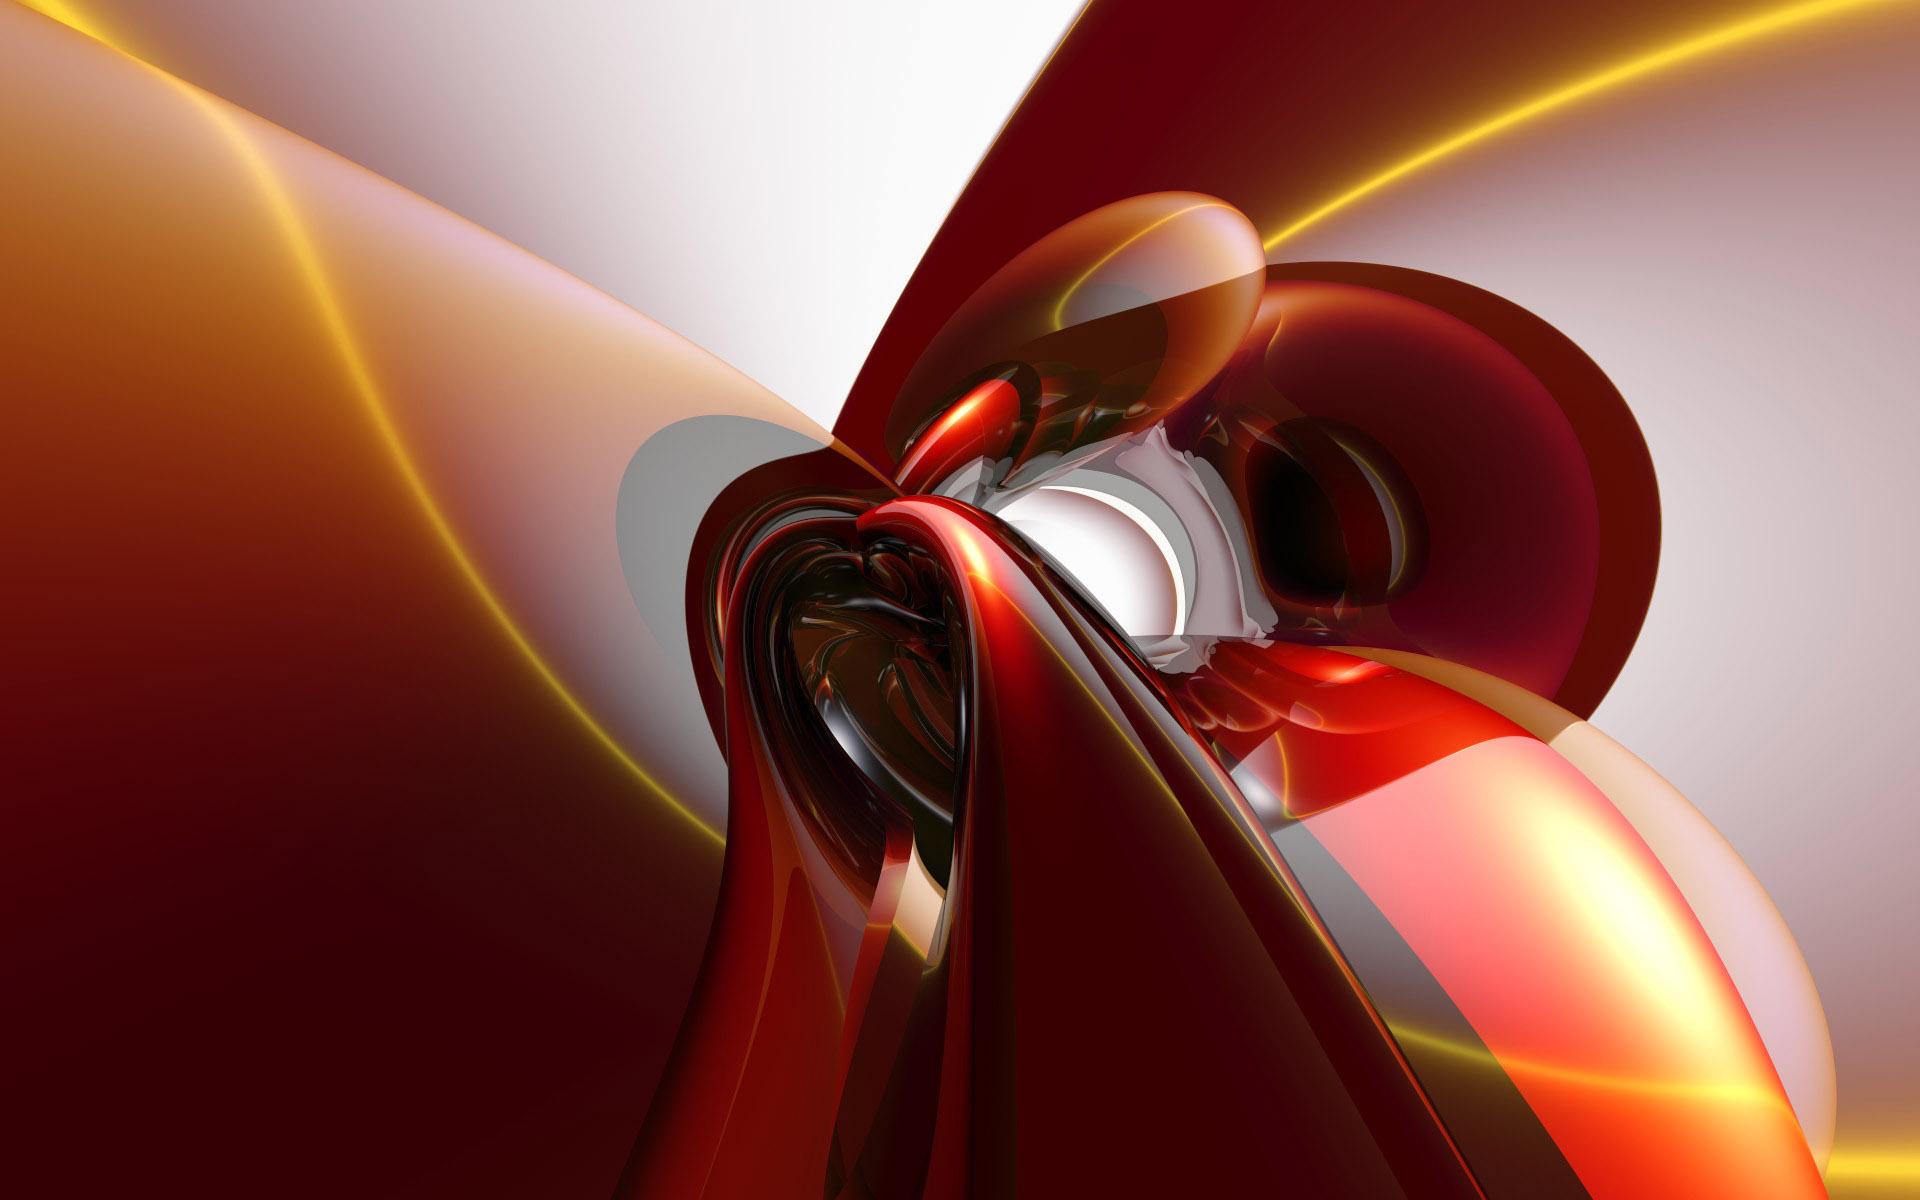 fond d'ecran 3d rouge